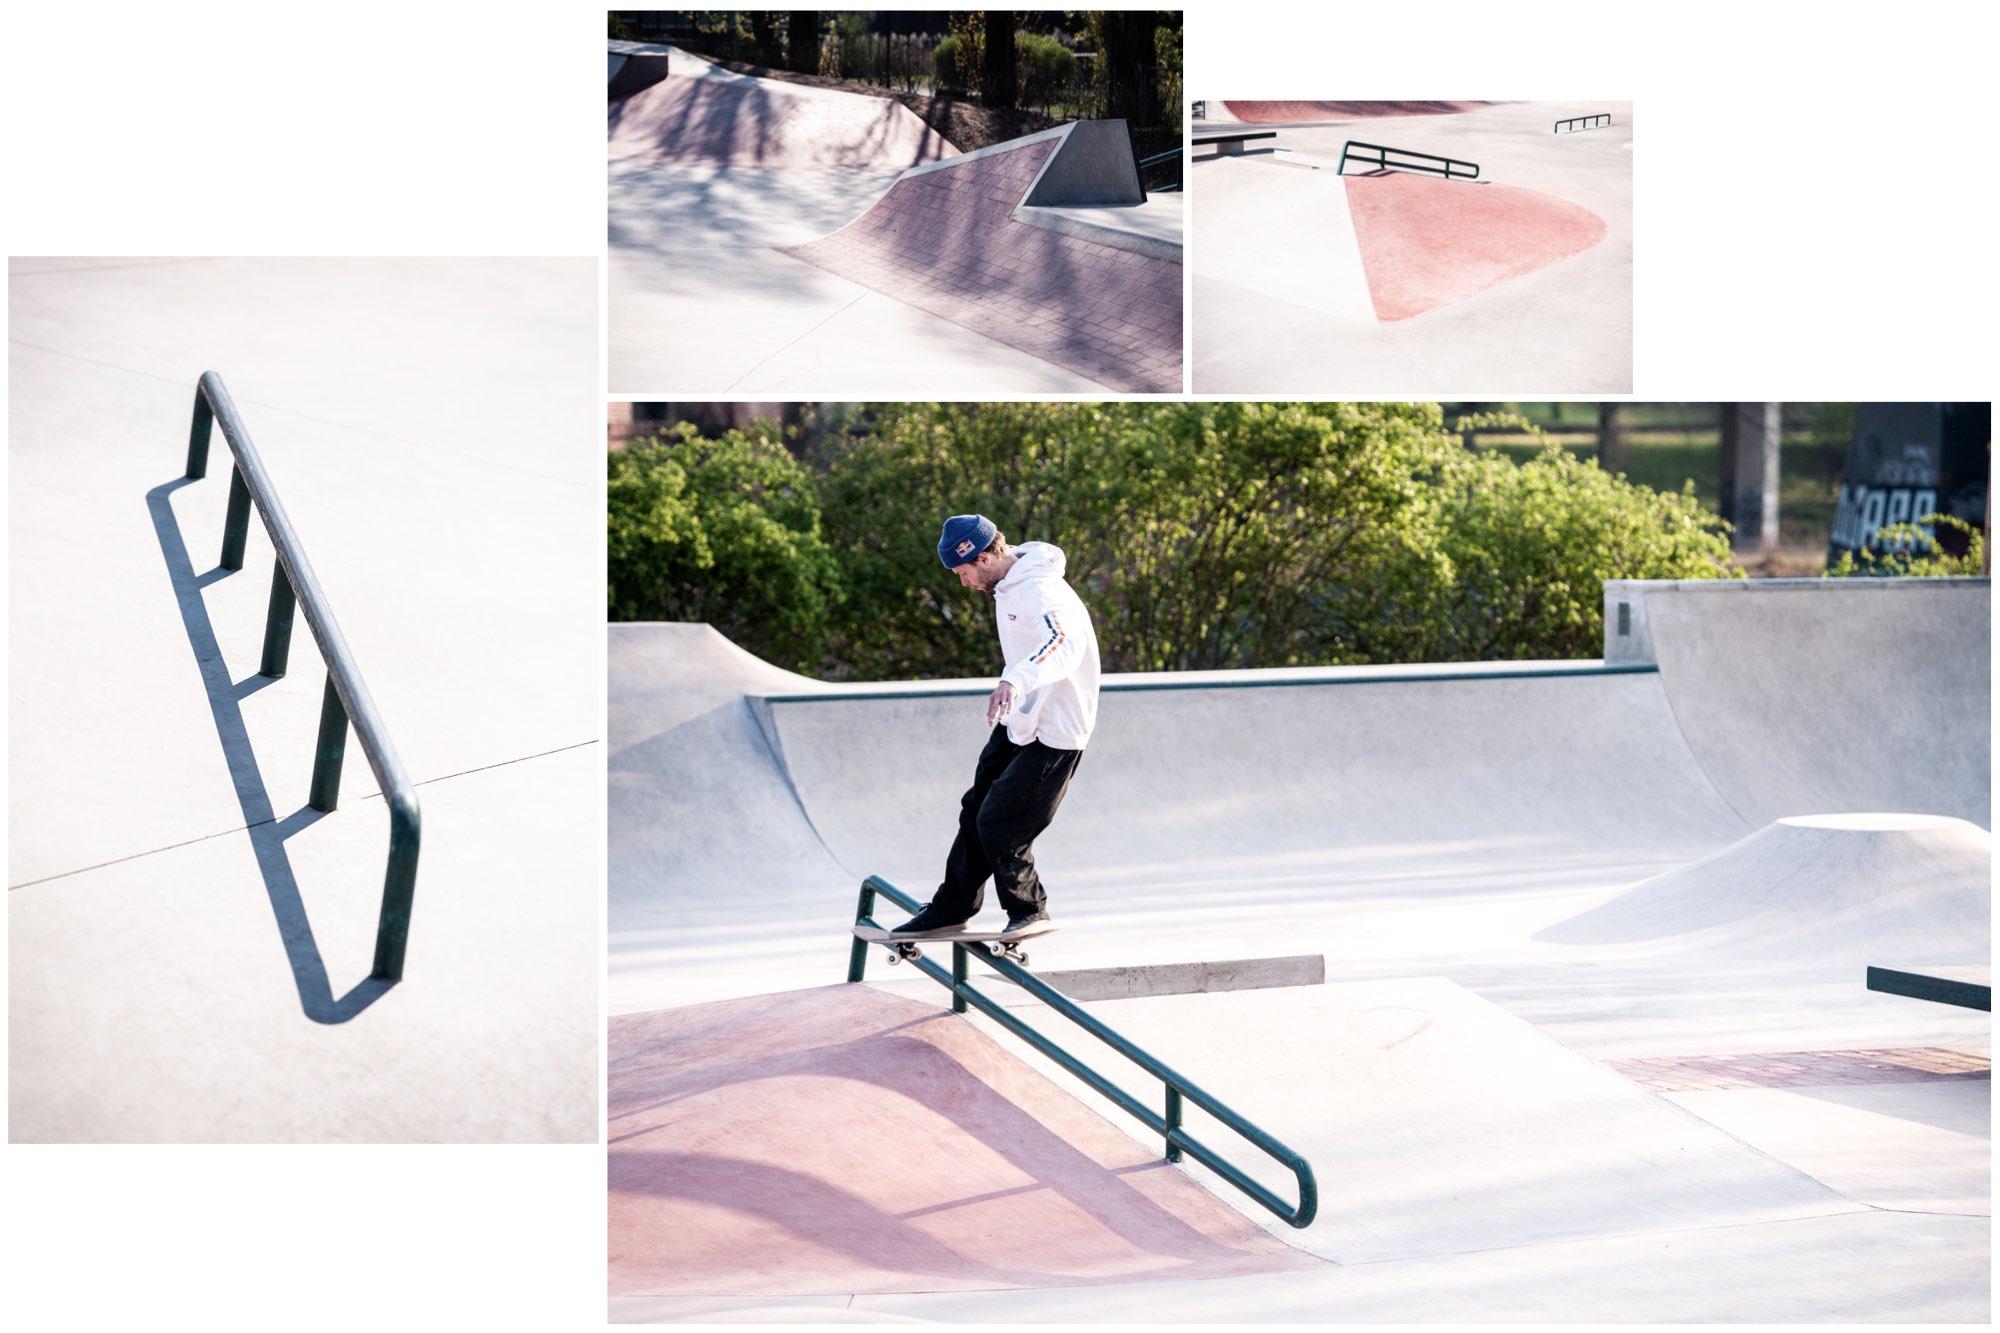 landskate_skatepark_planung_saarbrcken_jost-arens